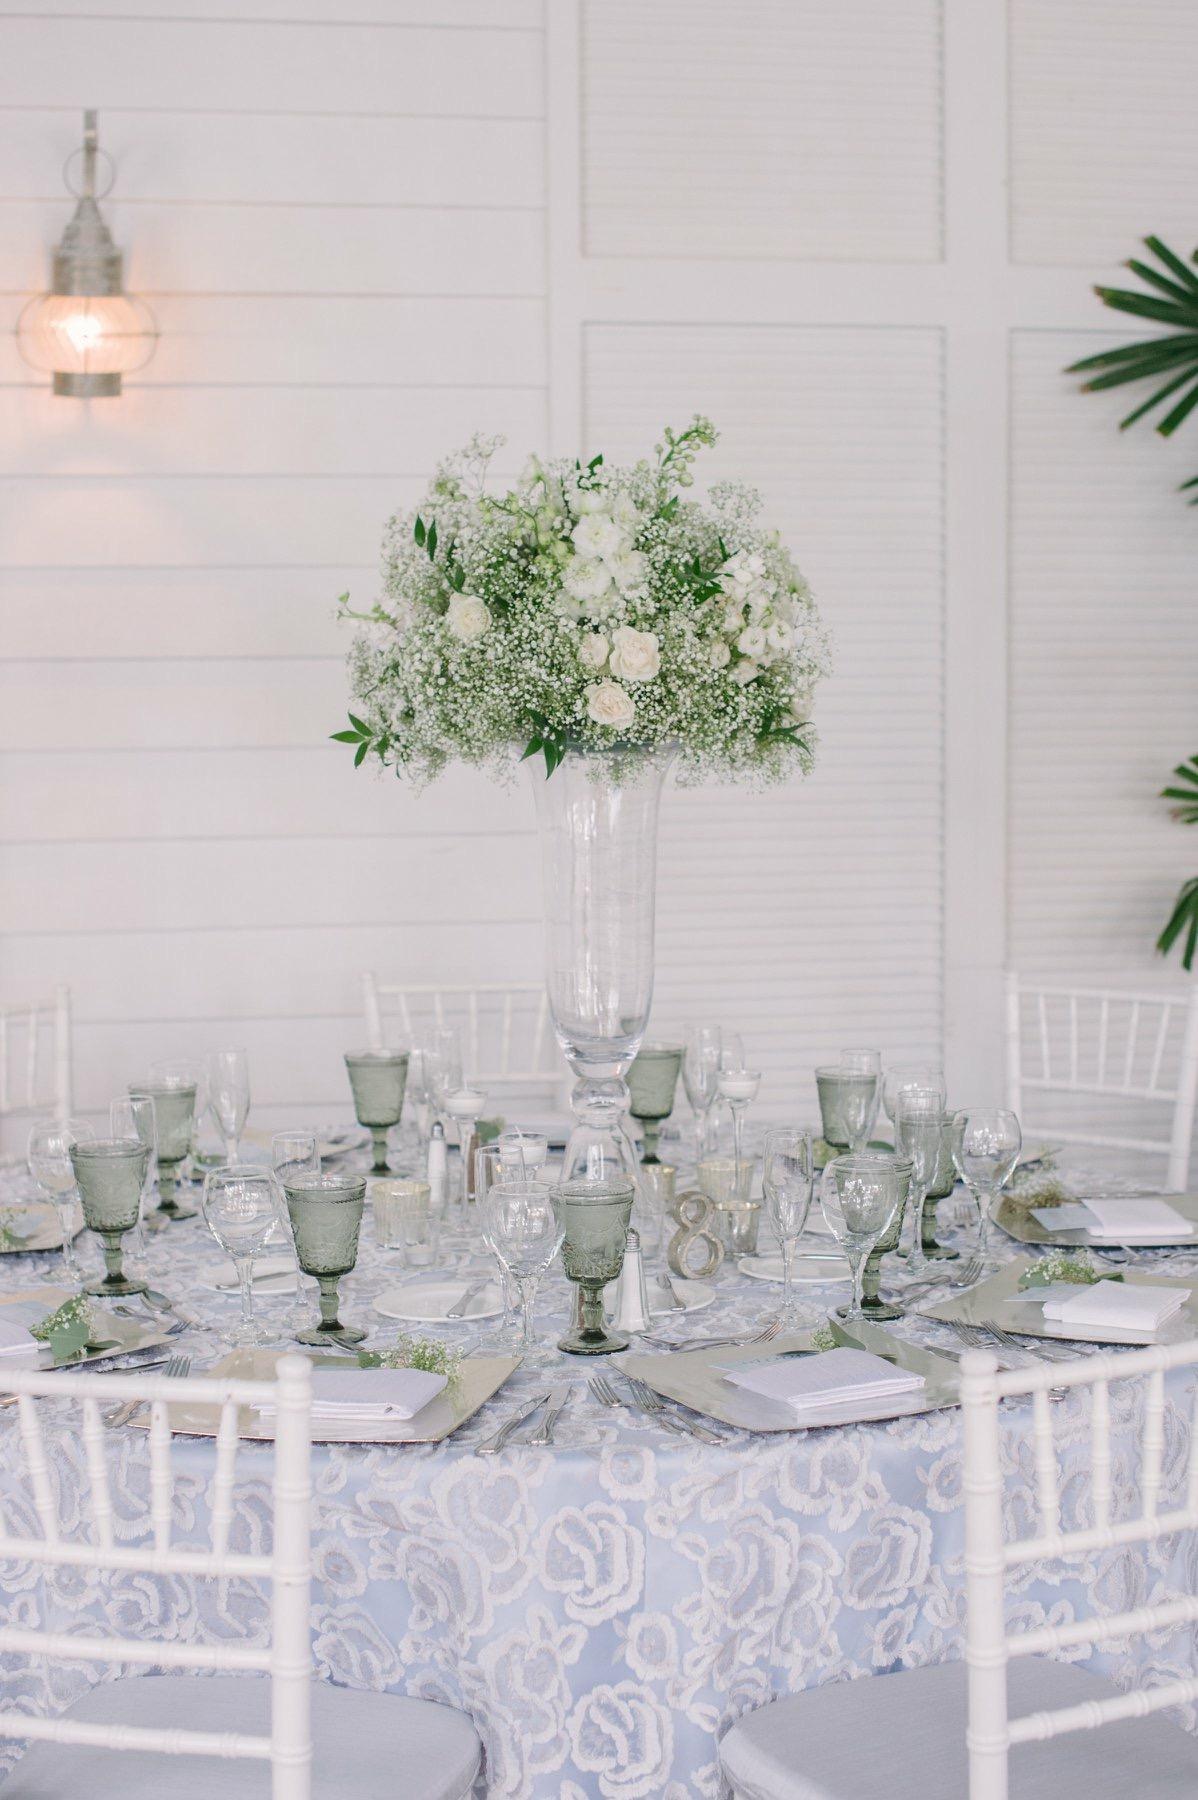 Clarity and Class Nuage Linens Designer Wedding